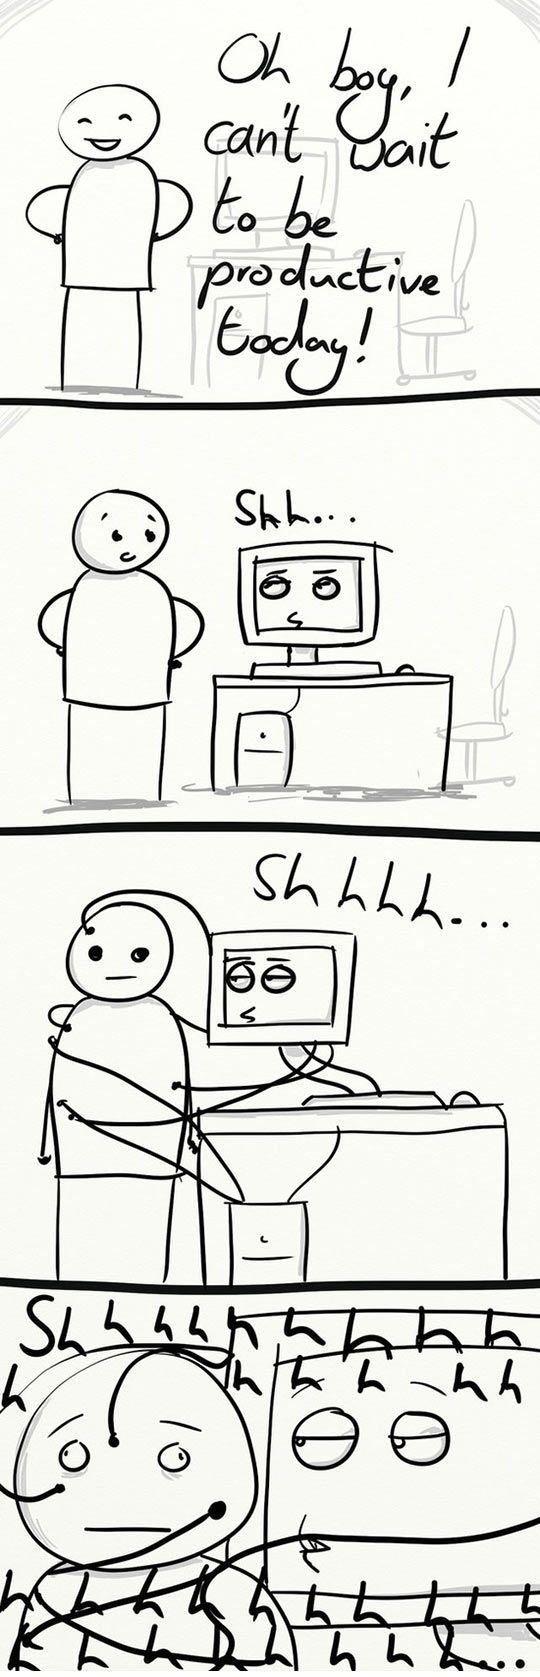 computer-ate-my-brain